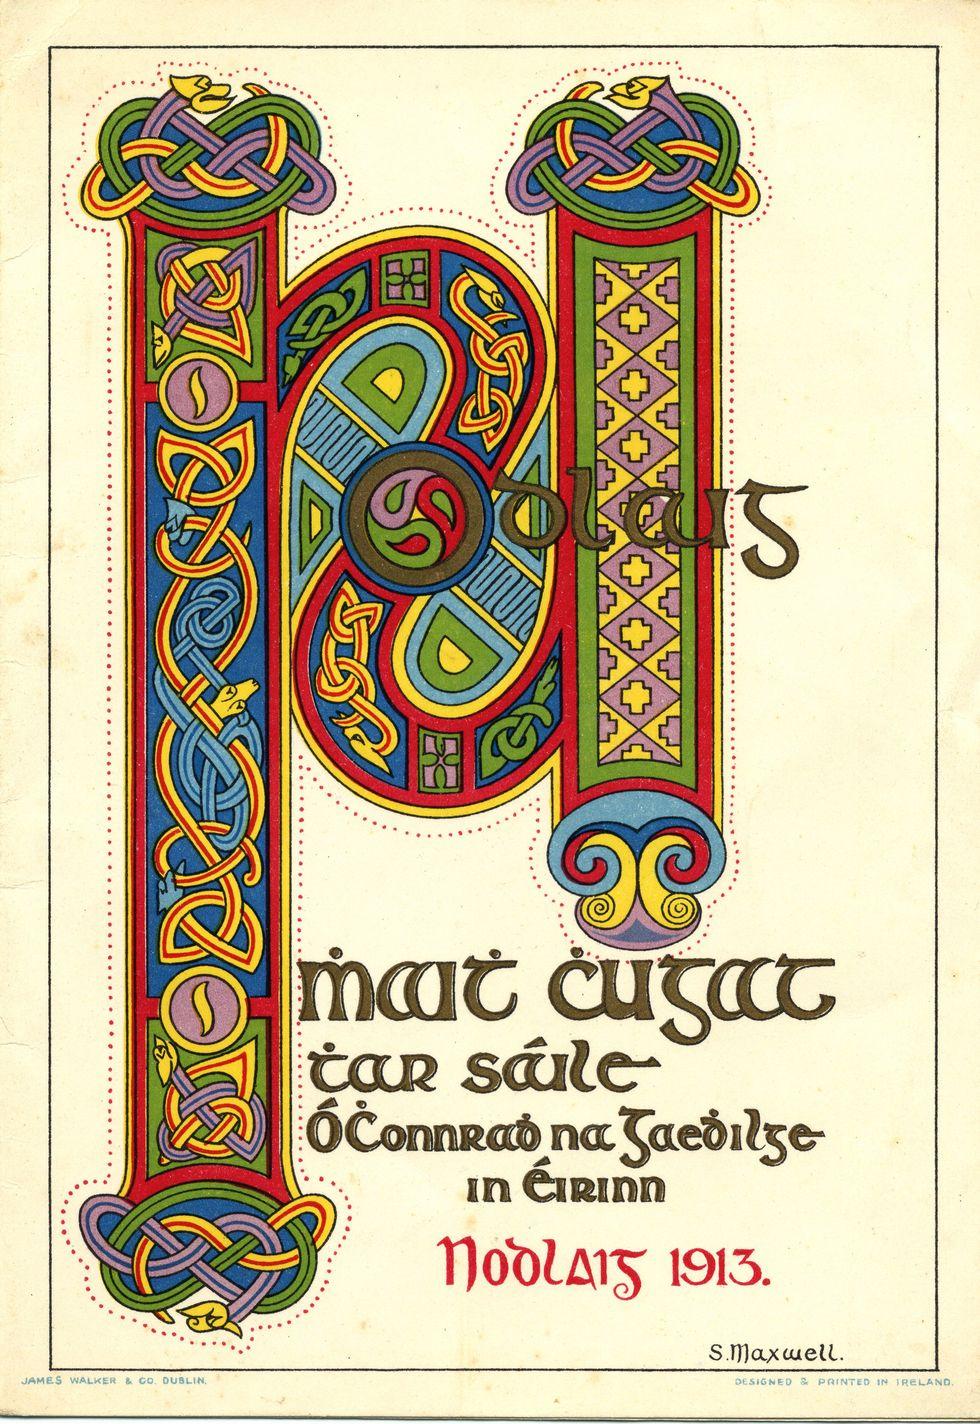 Conradh na Gaeilge Christmas card, 1913. | Ireland | Pinterest ...